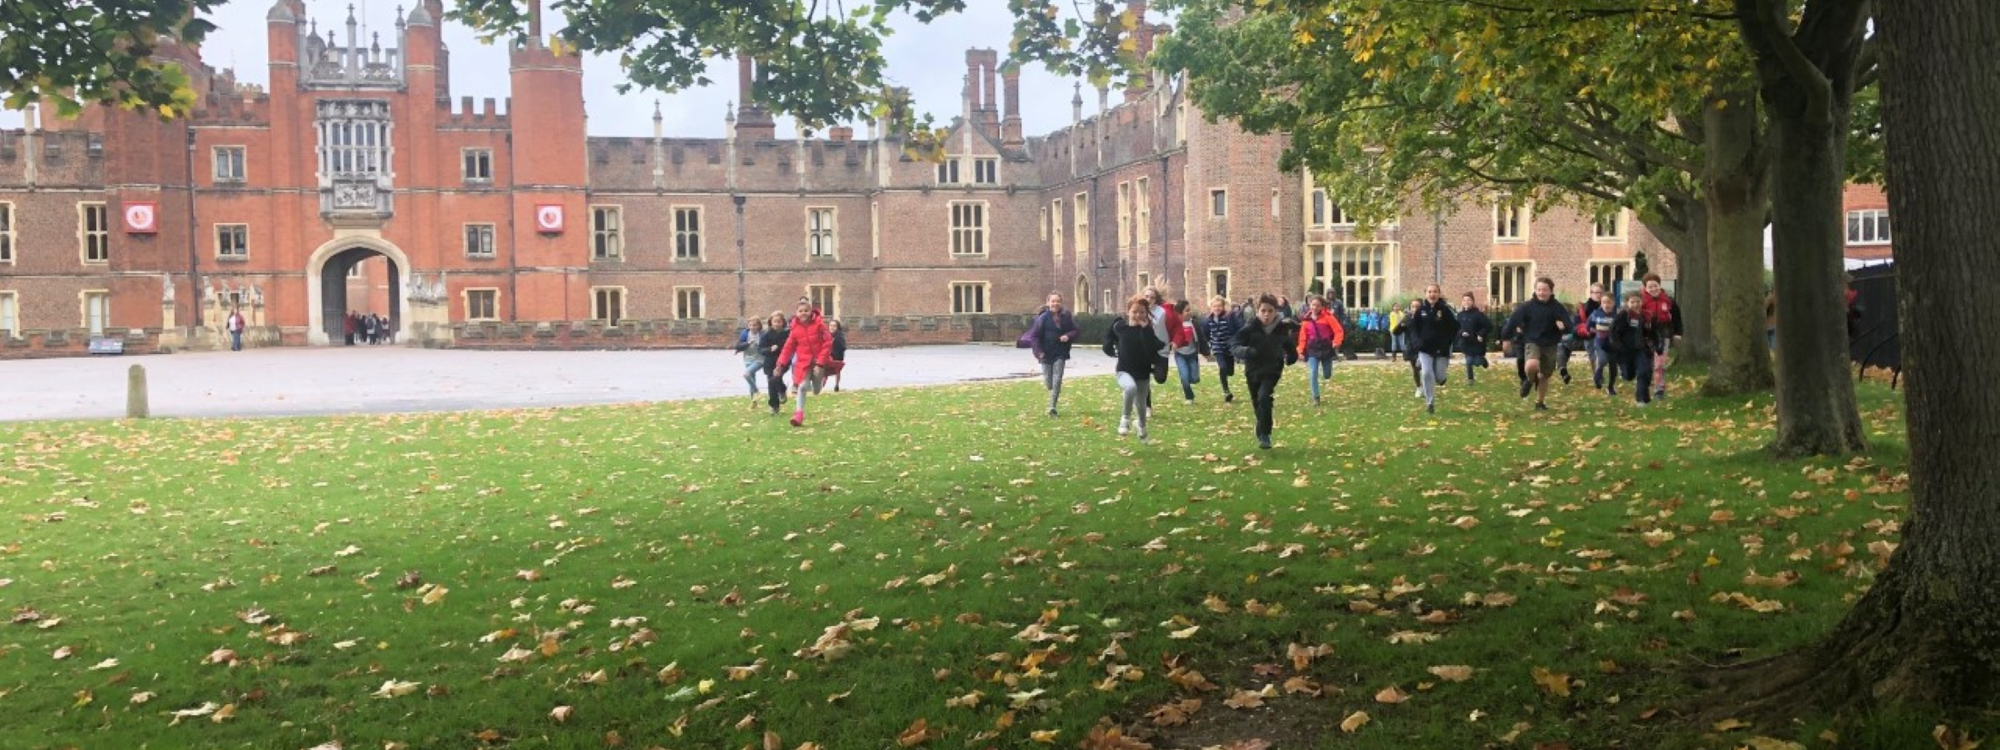 Hampton Court playtime 1 Header photo for Mission, vison, core values resized